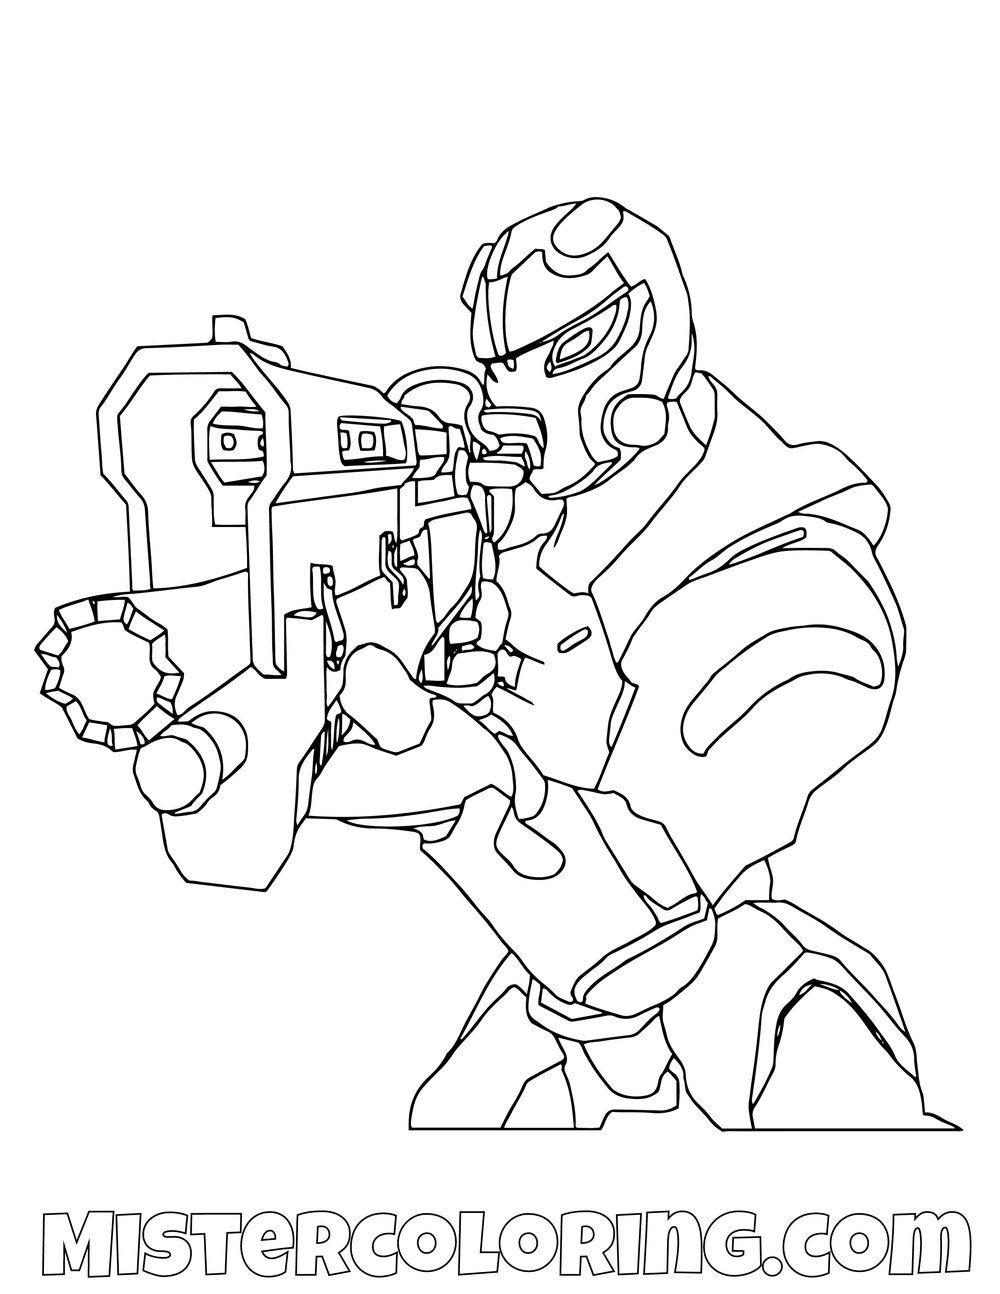 Pin On Draws